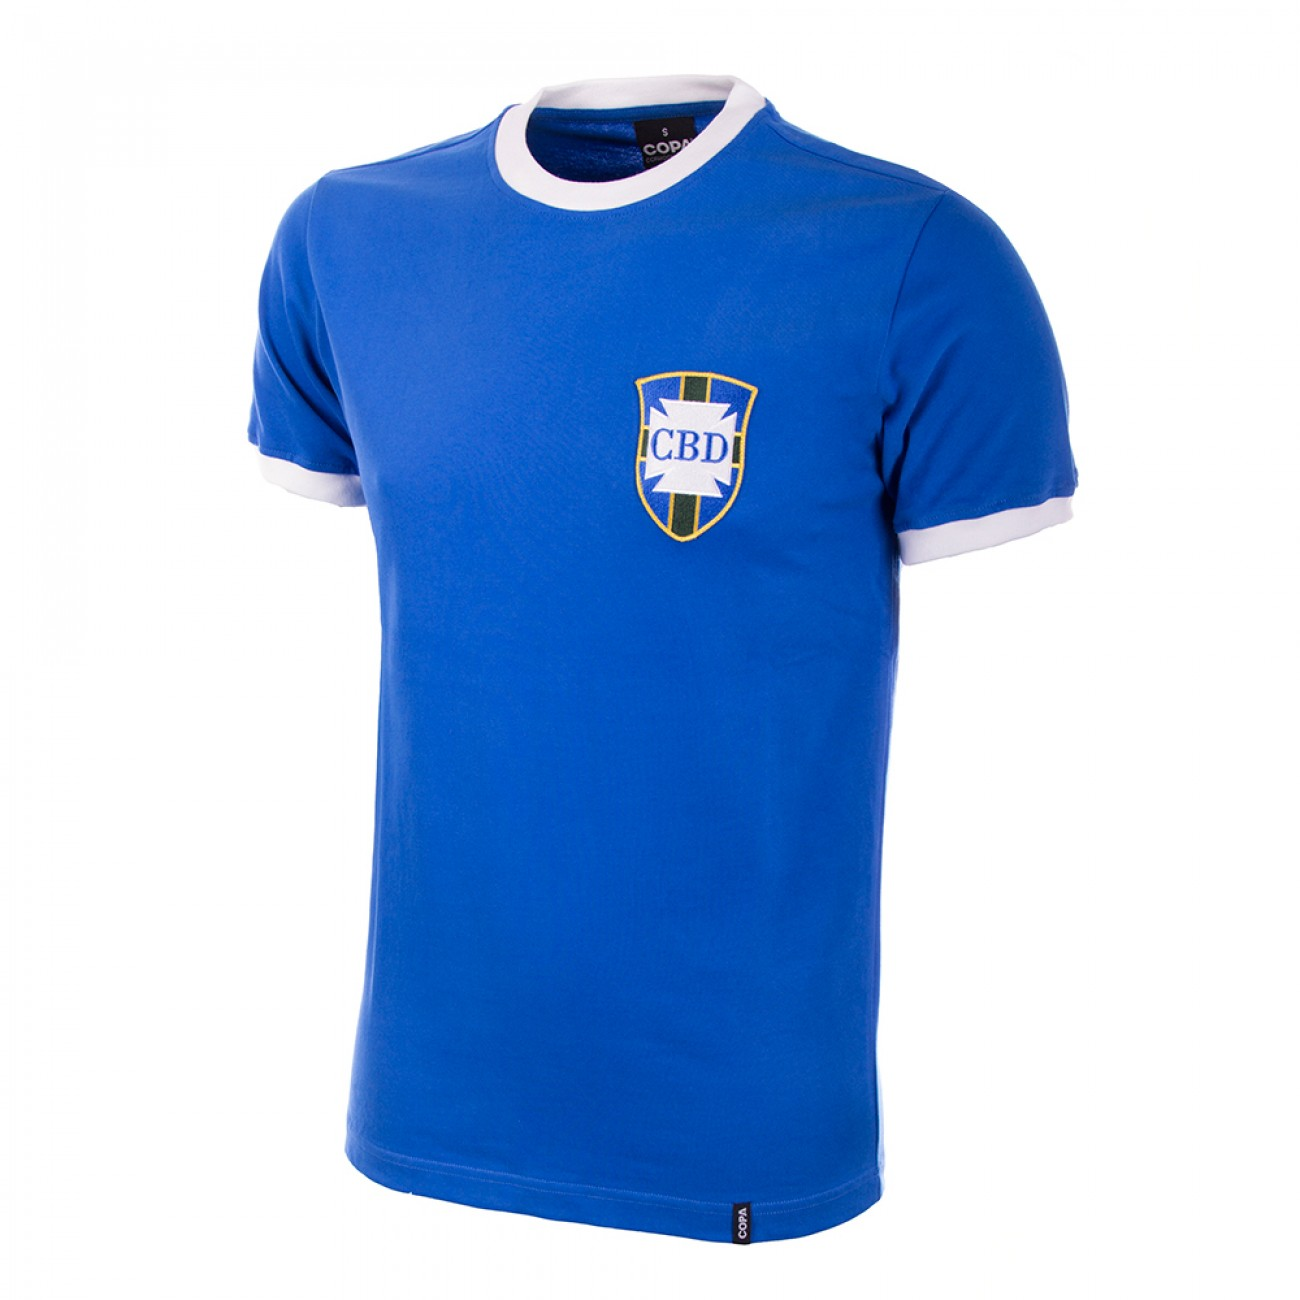 http://www.retrofootball.es/ropa-de-futbol/camiseta-brasil-2-equipacion-a-os-70.html